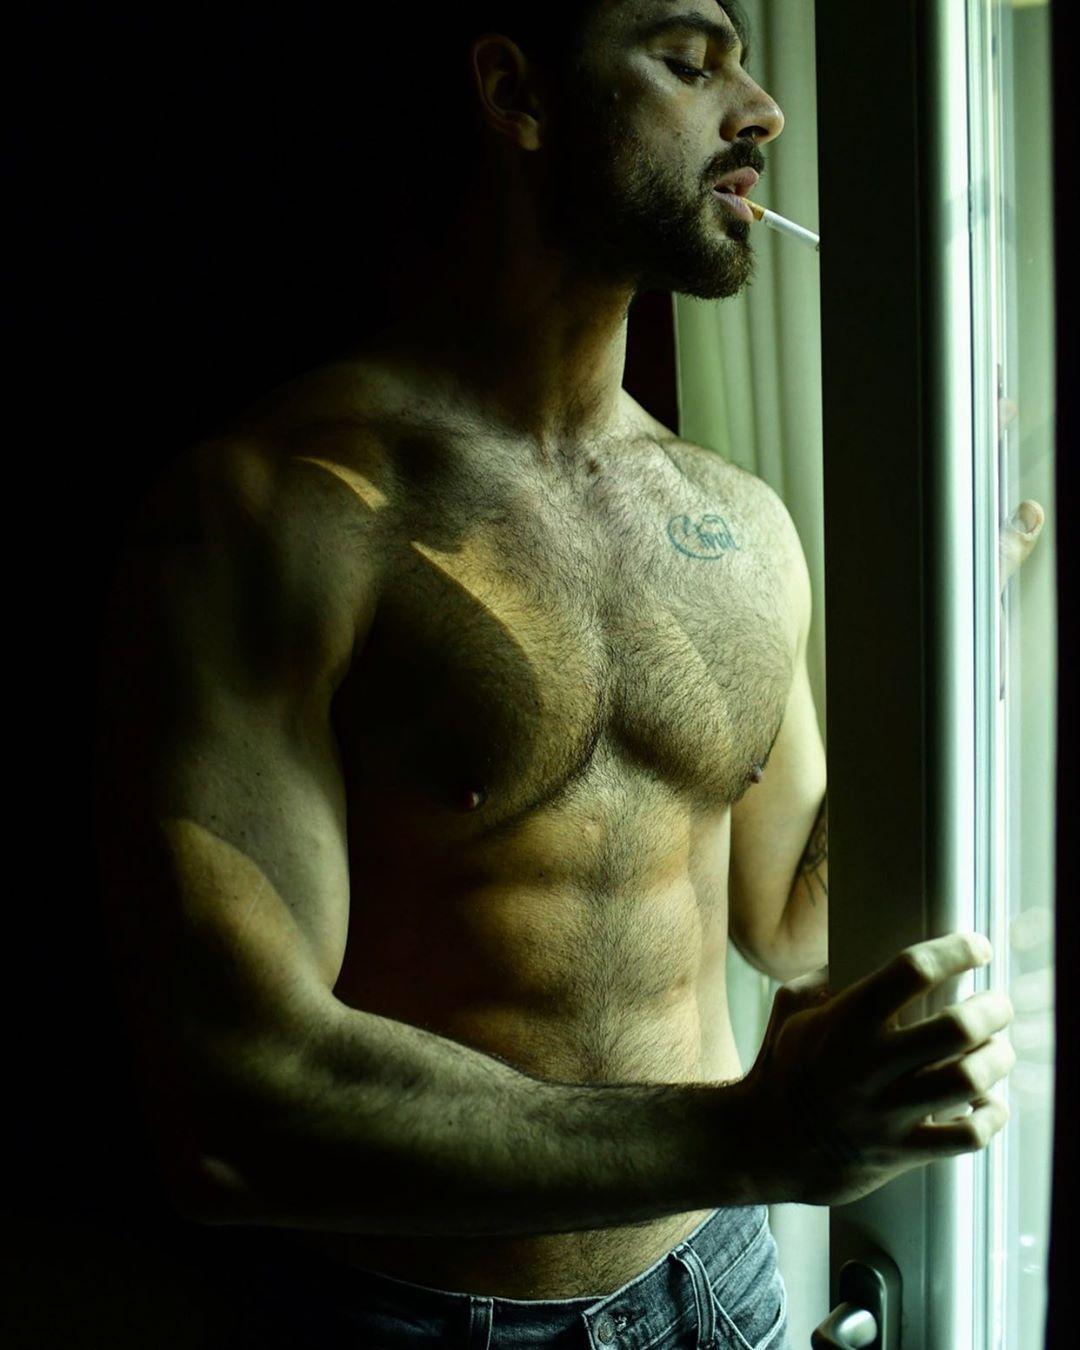 michele morrone #hot #hotguys #cute #handsome #pretty